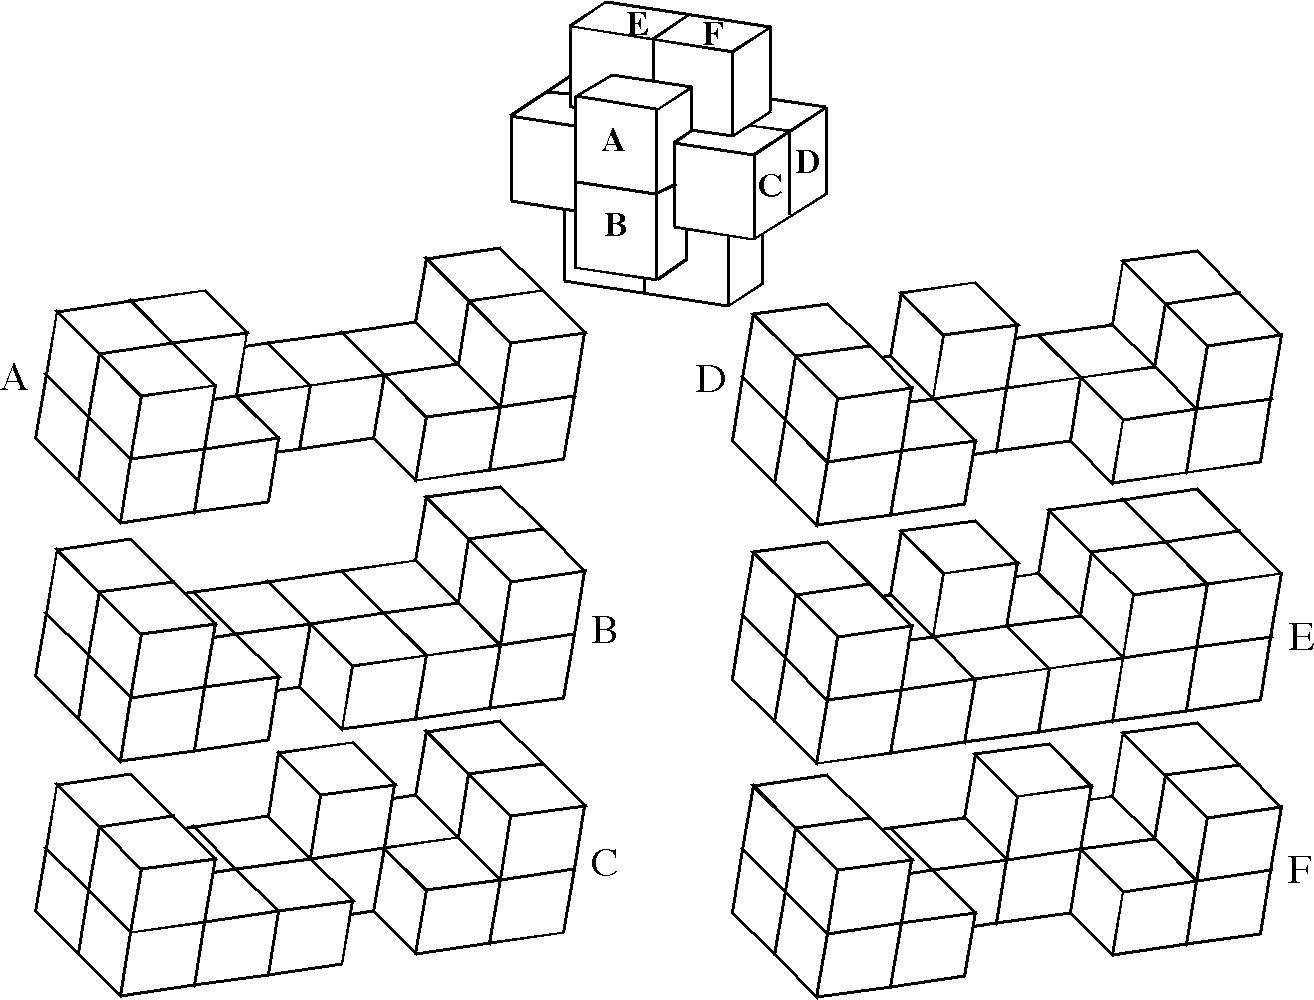 Wood Puzzle Pieces